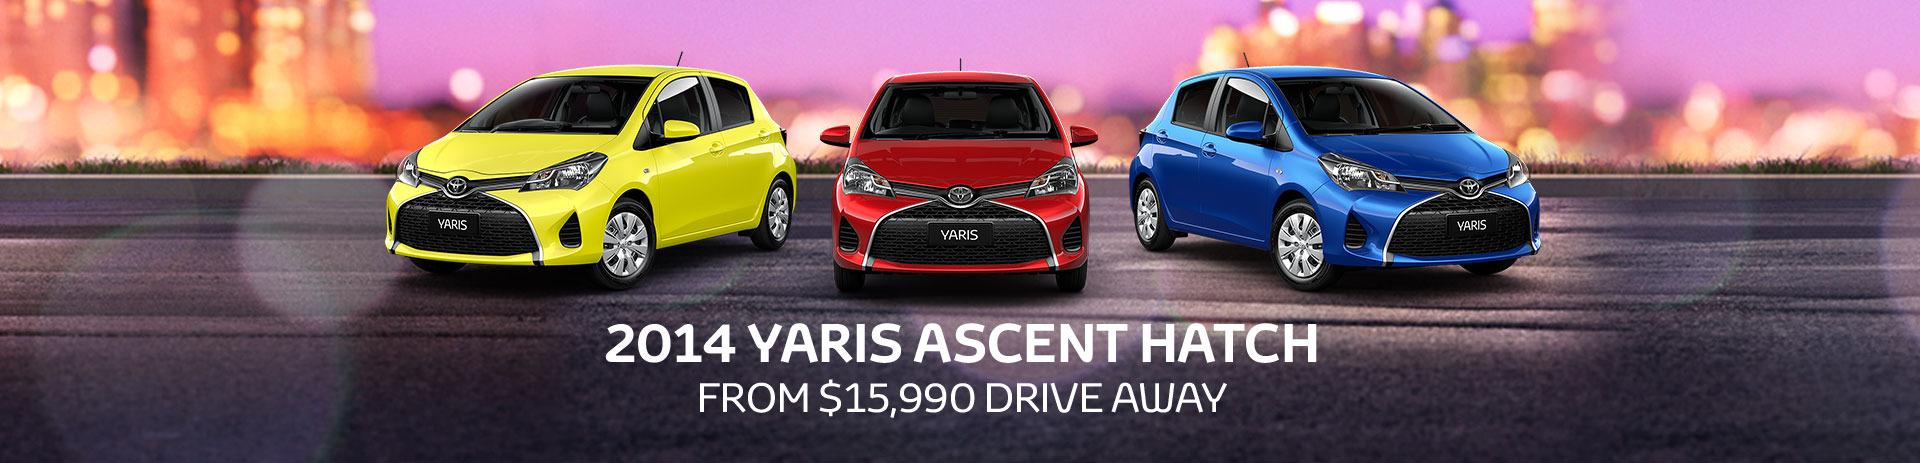 Toyota Yaris Offer